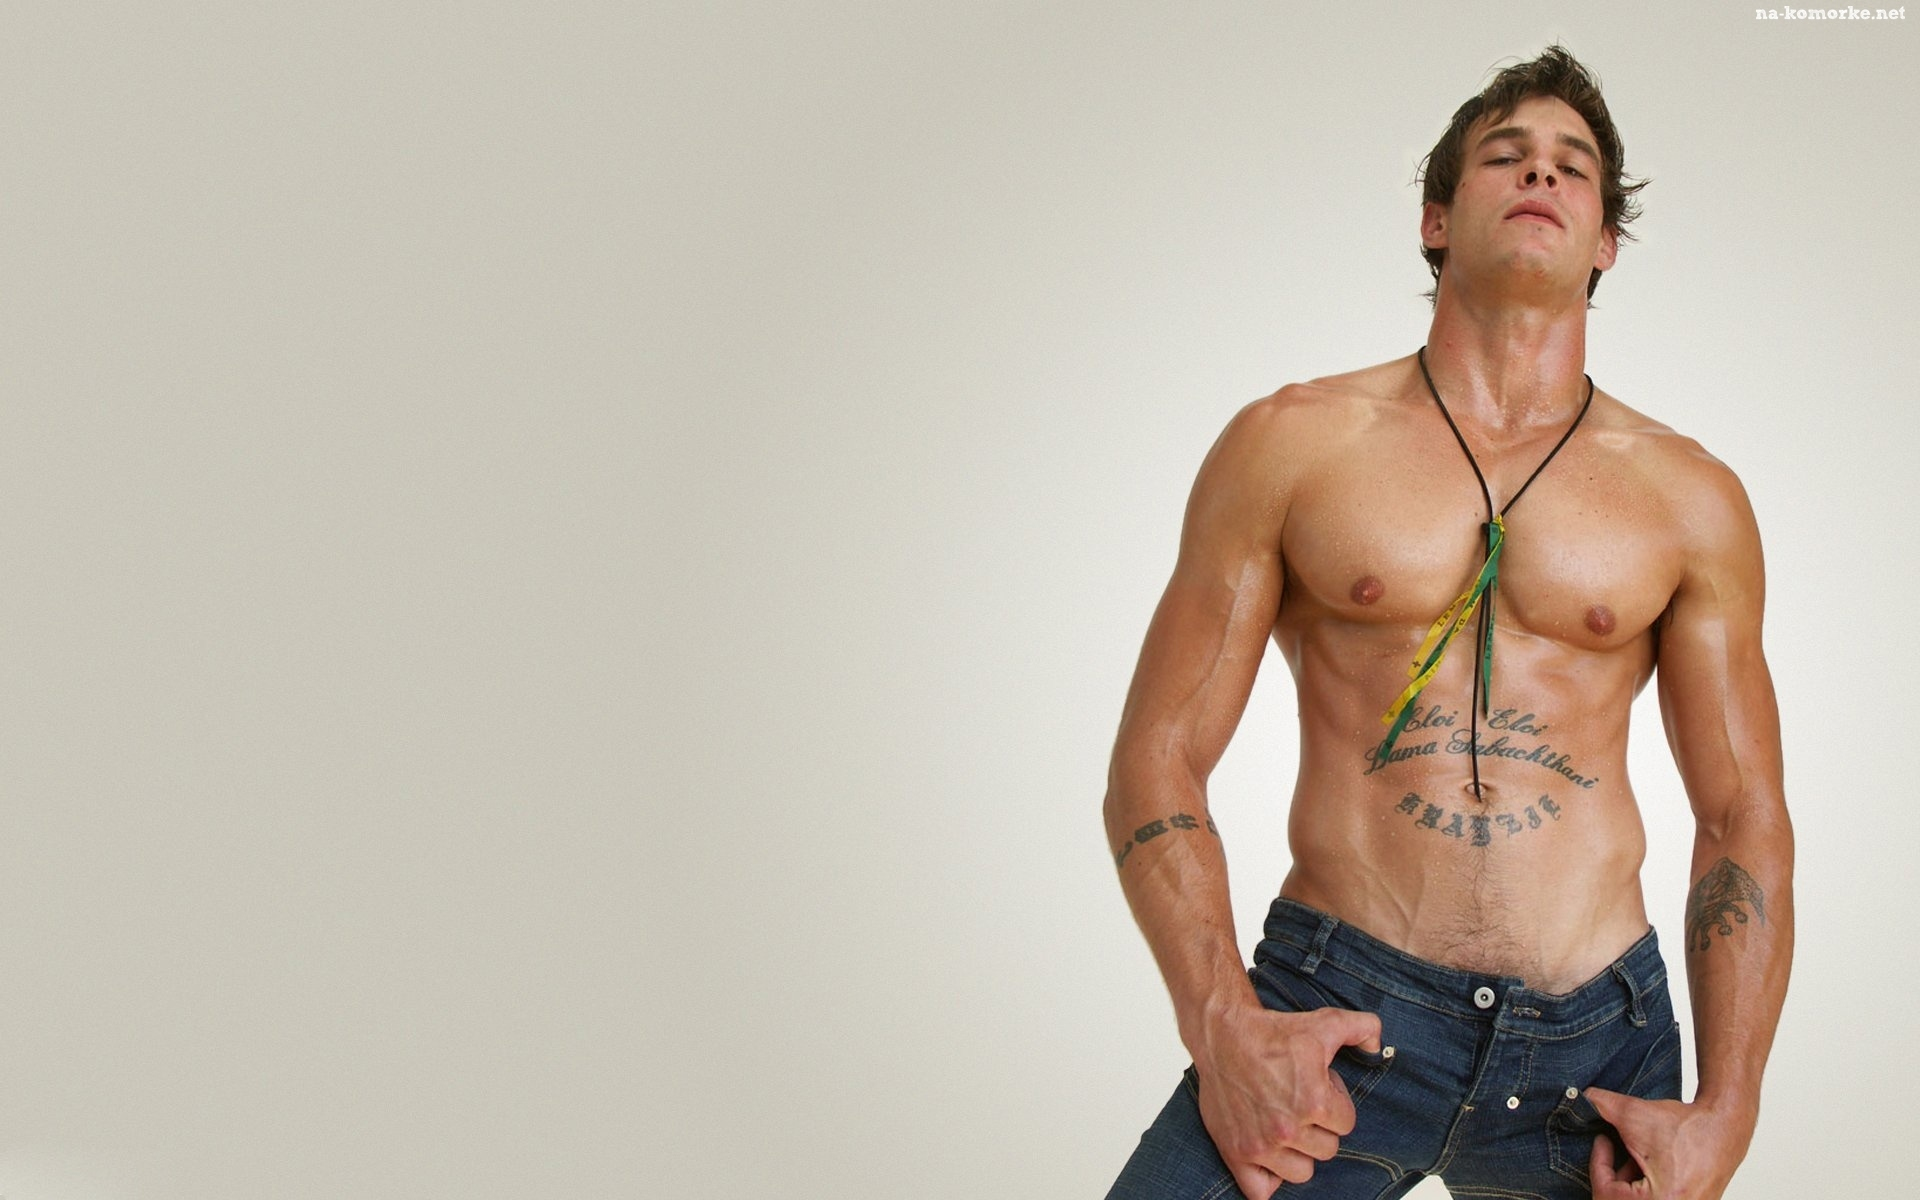 Brzuch Facet Super Ciało Tatuaż Na Komórkę